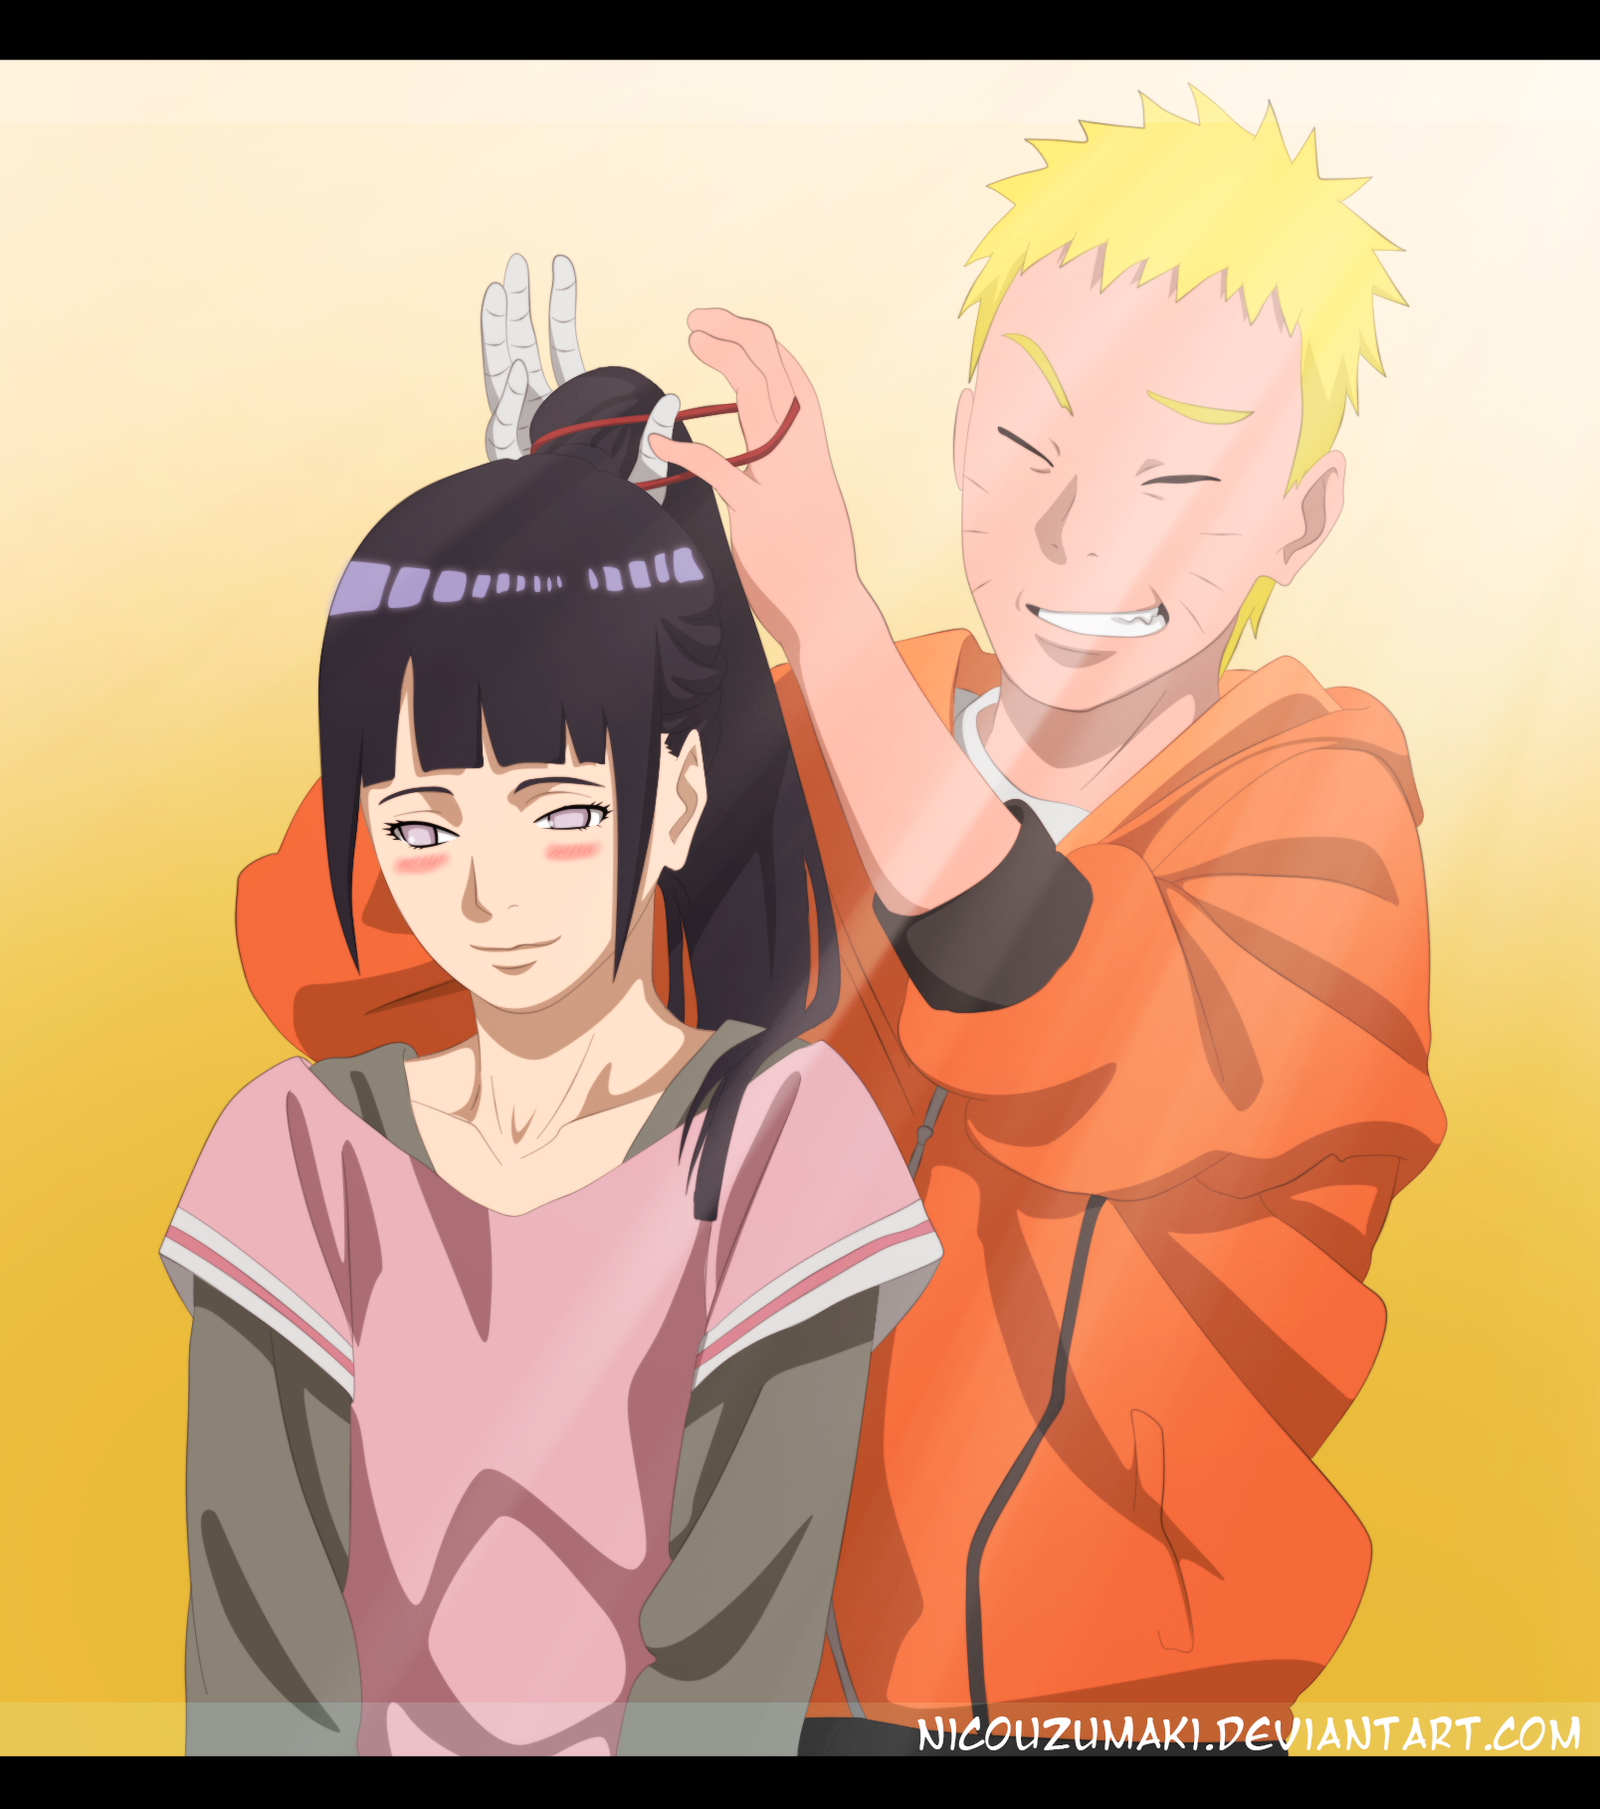 Naruto y hinata by nicouzumaki on deviantart naruto y hinata by nicouzumaki voltagebd Images